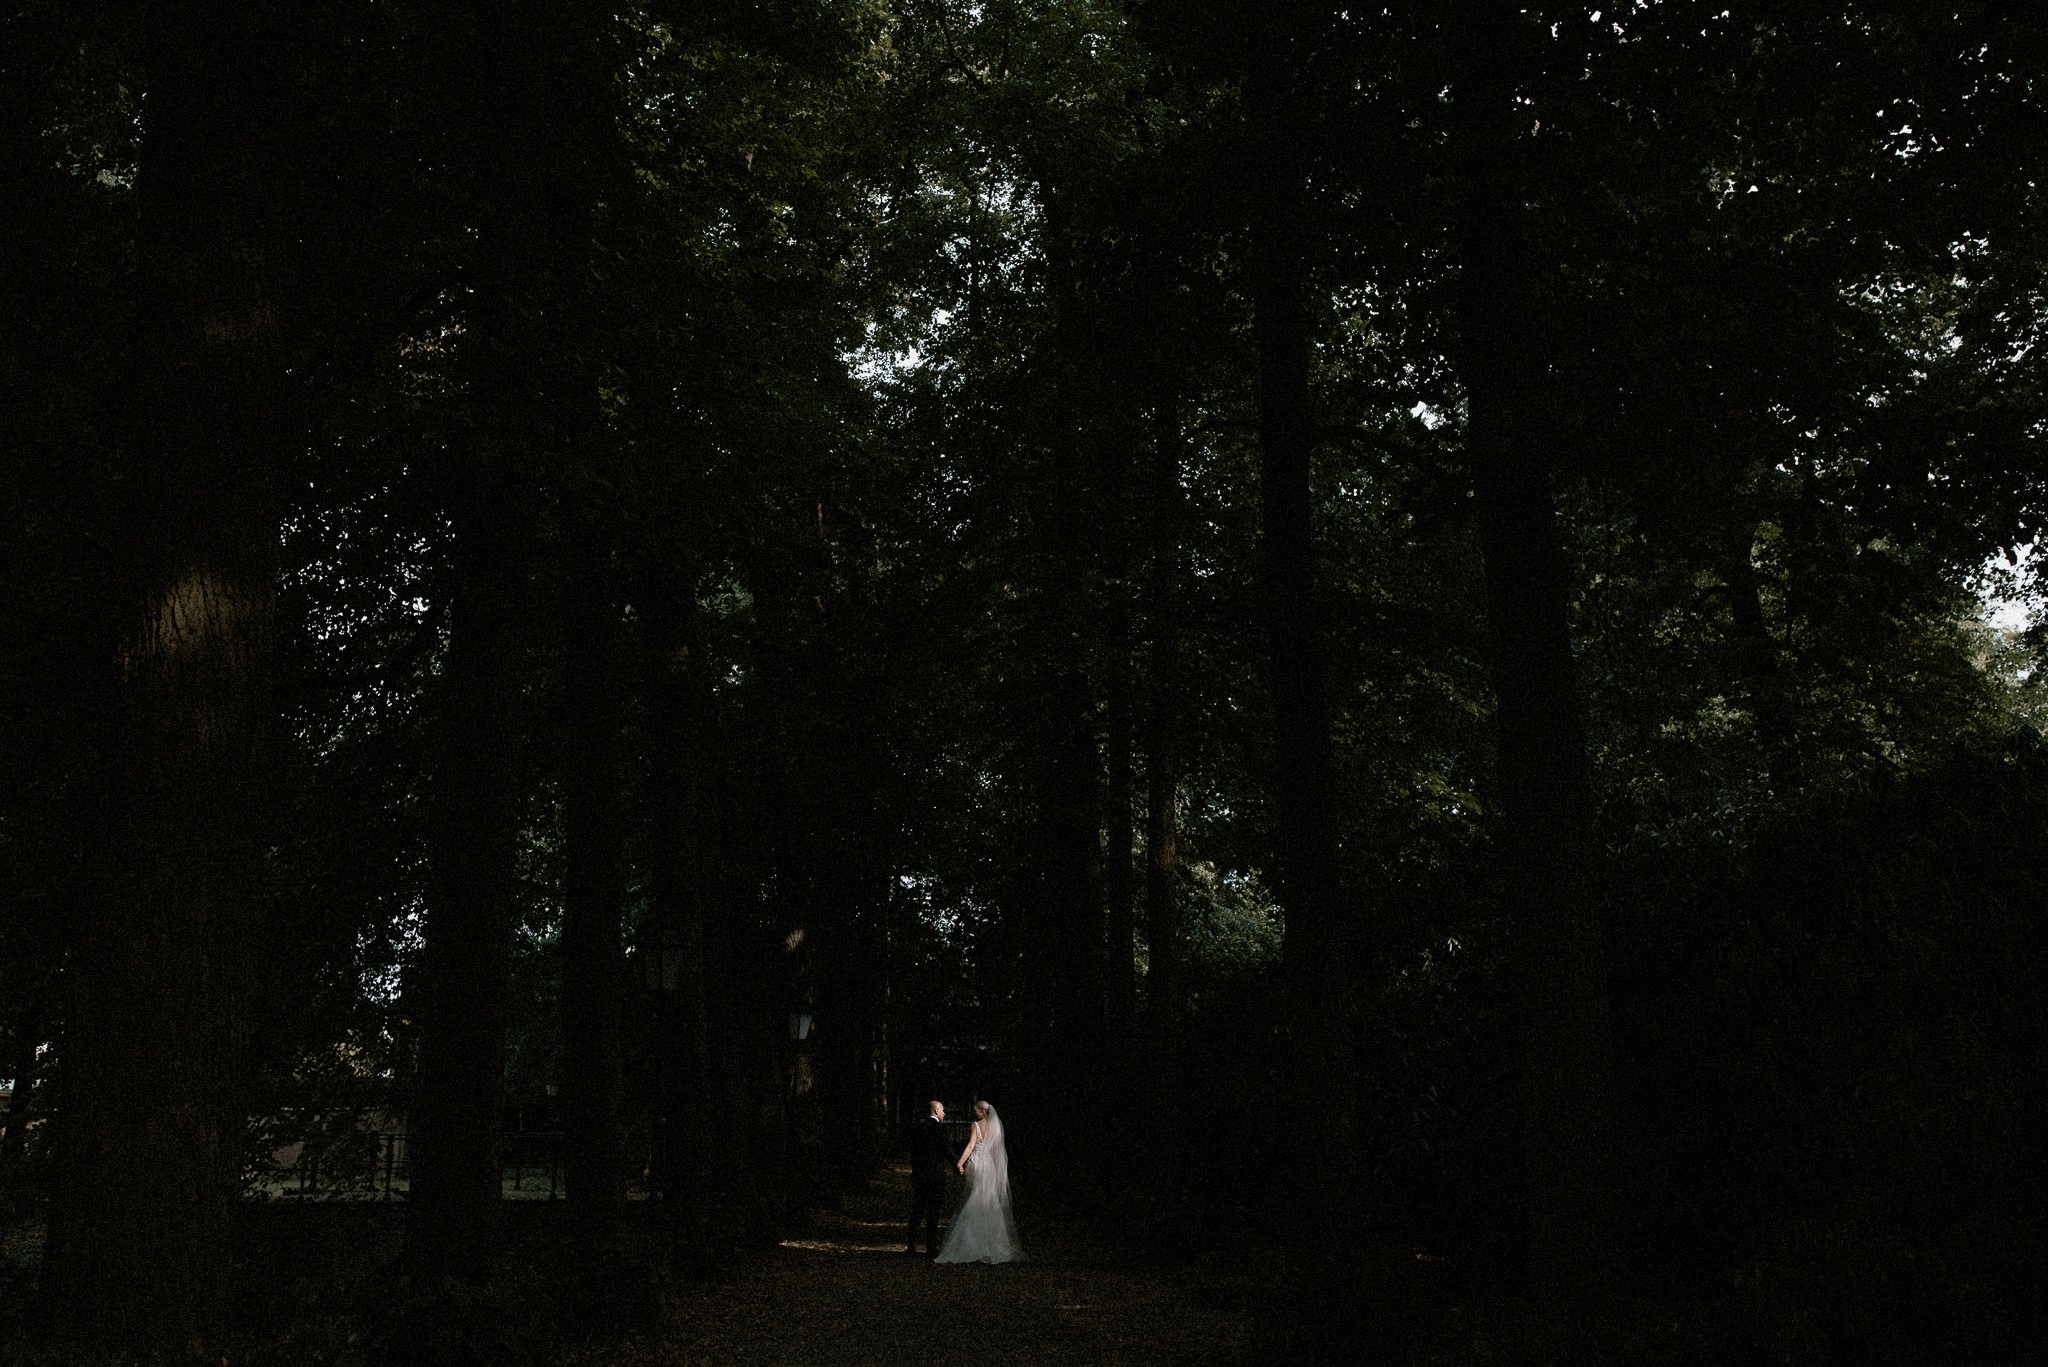 Bruidsfotografie Buitenplaats Sparrendaal - Naomi van der Kraan 0051.jpg